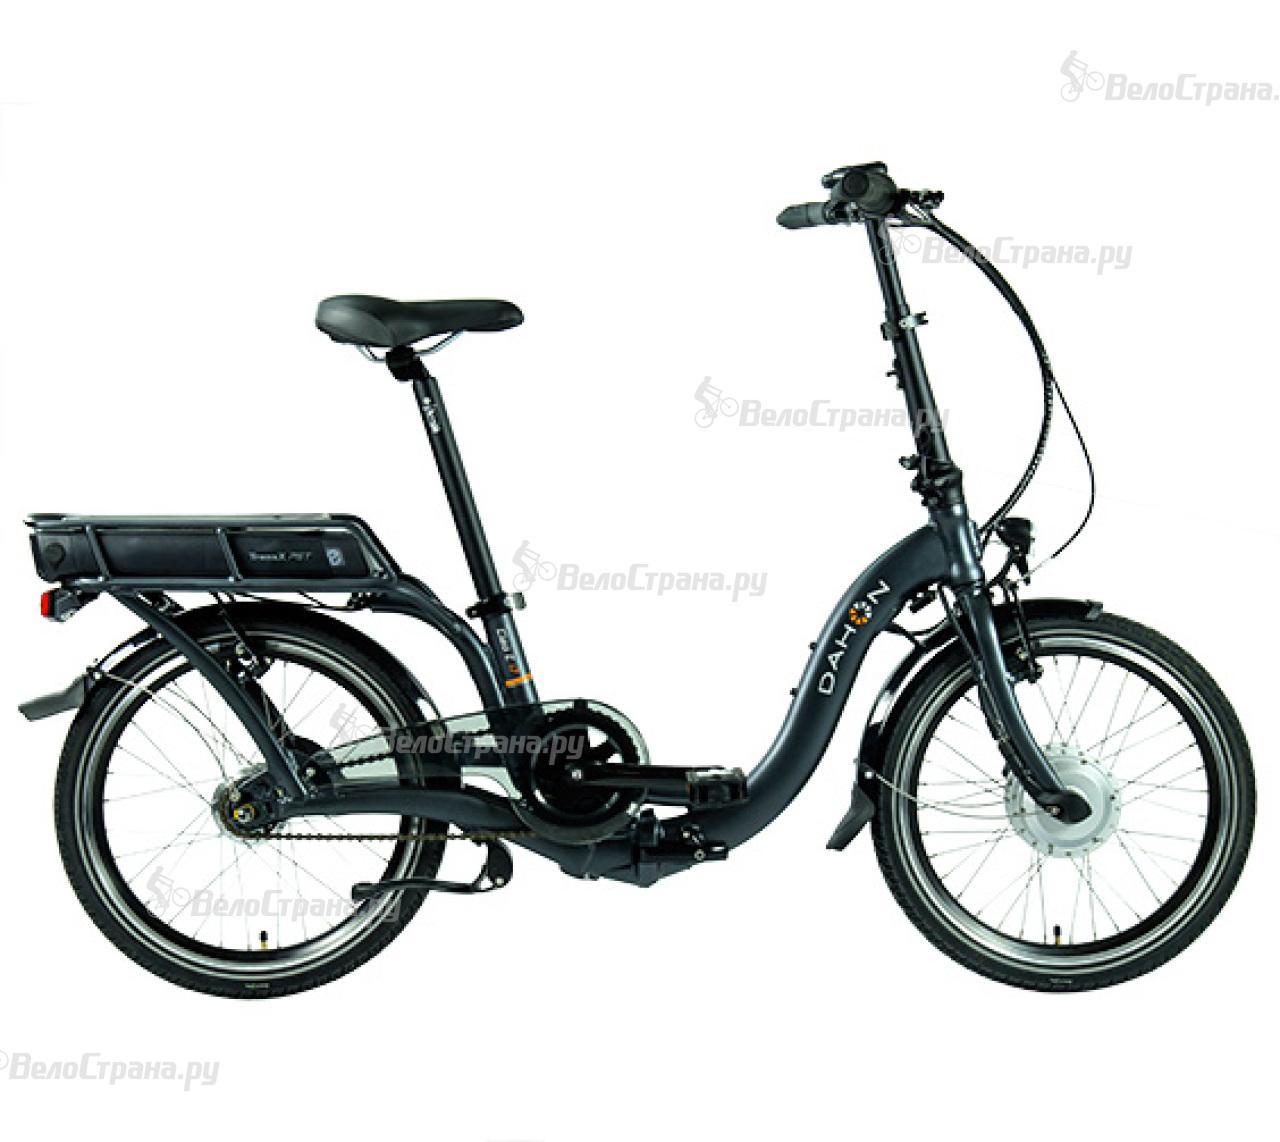 Велосипед Dahon Ciao E i7 (2017) велосипед dahon ciao d7 2015